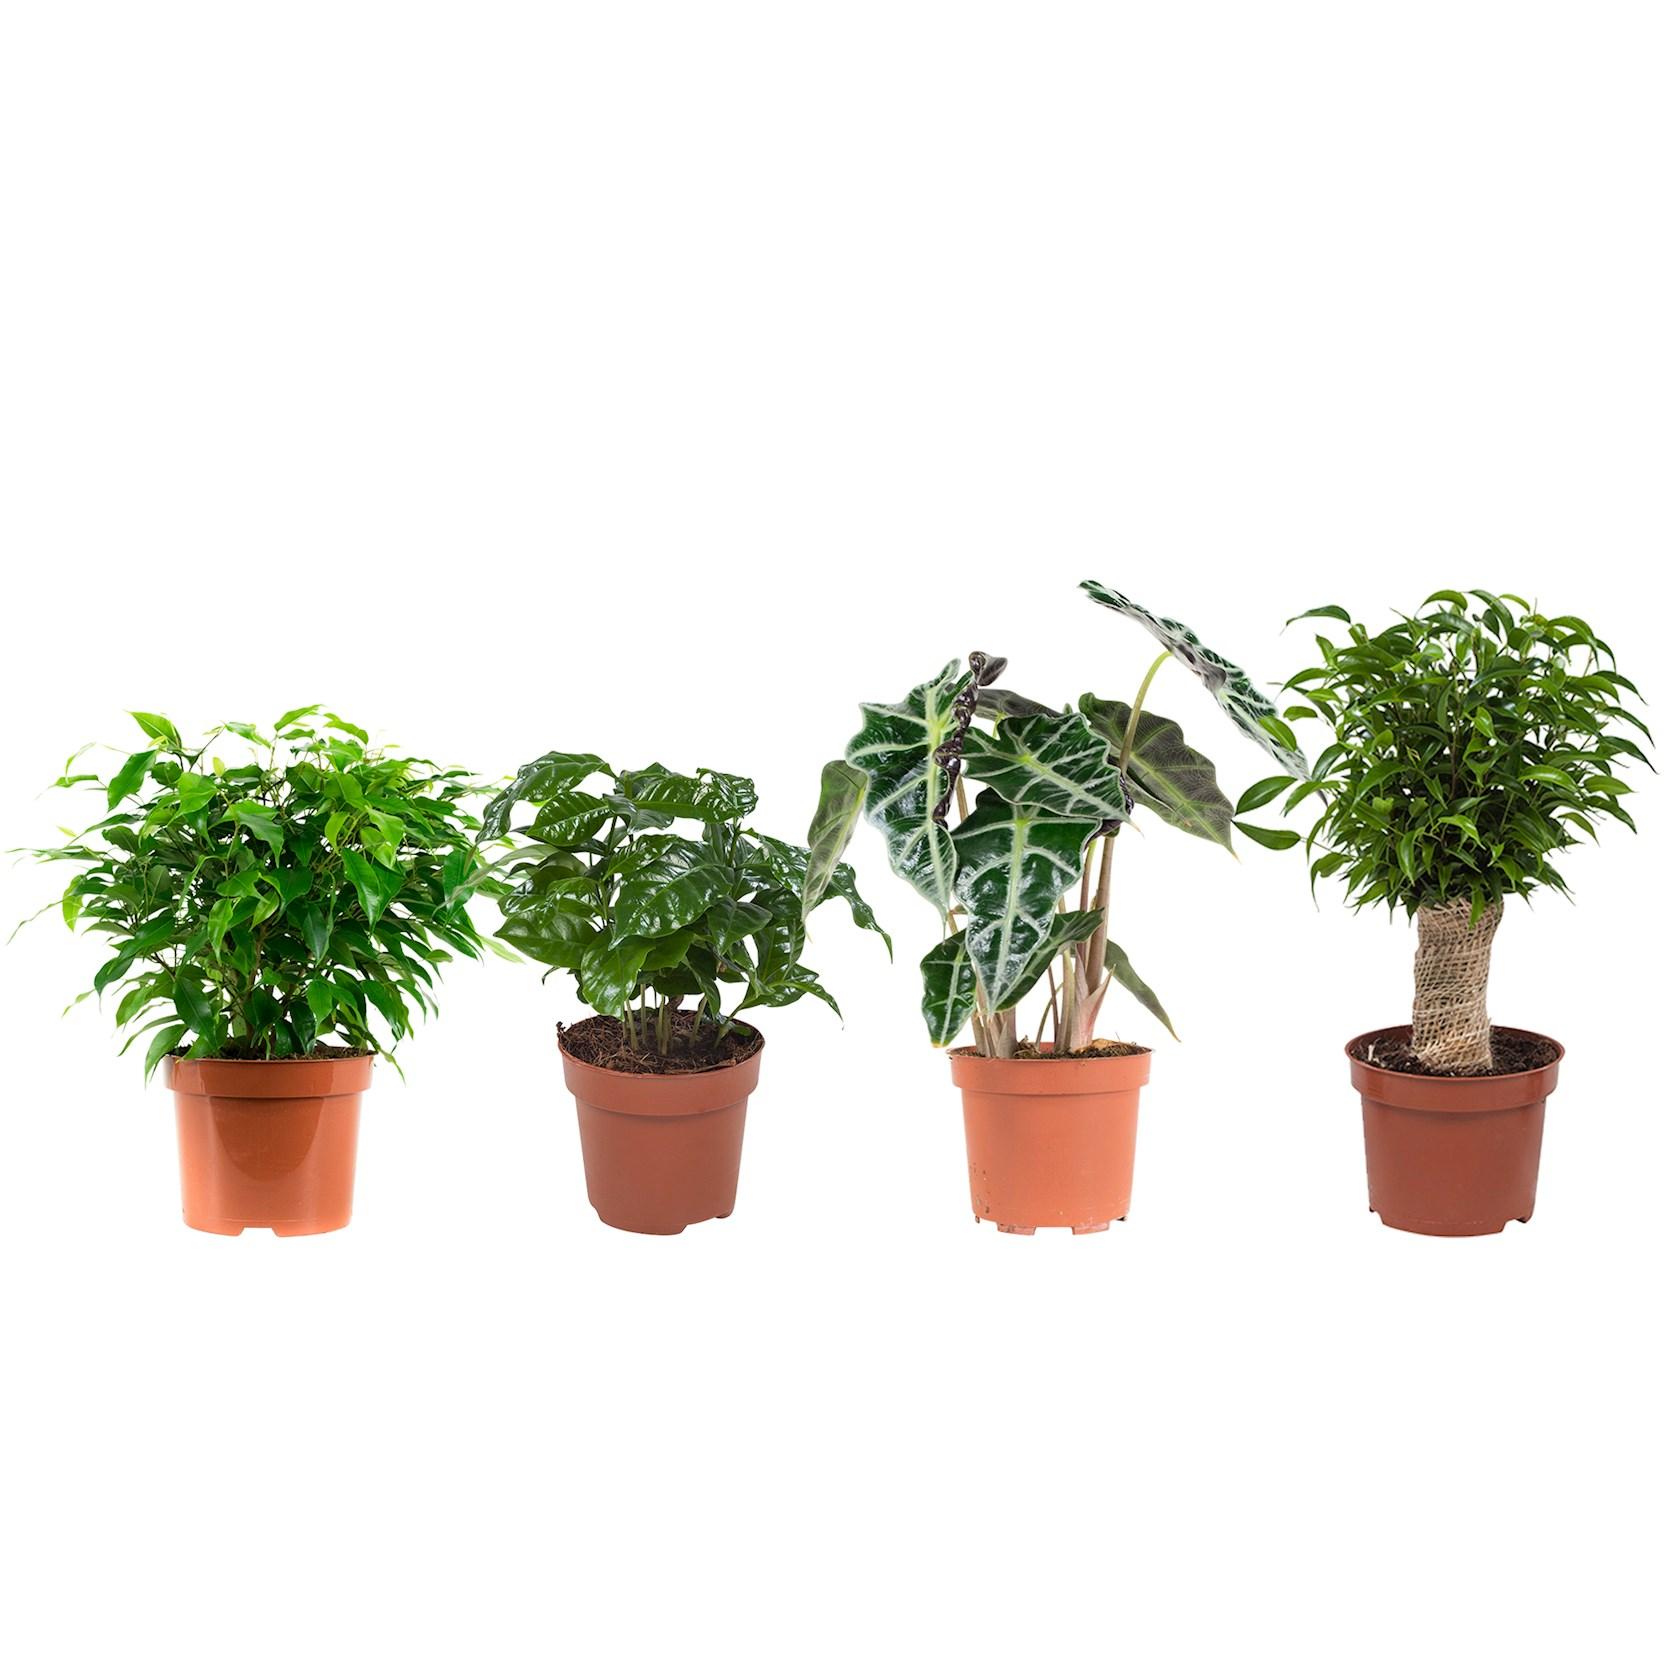 4 stuks Ficus (Ficus Green Kinky), Koffieplant (Coffea Arabica), Olifantsoor of Skeletplant (Alocasia Polly), Ficus (Ficus Natasja) - pot 12cm - hoogte 25cm